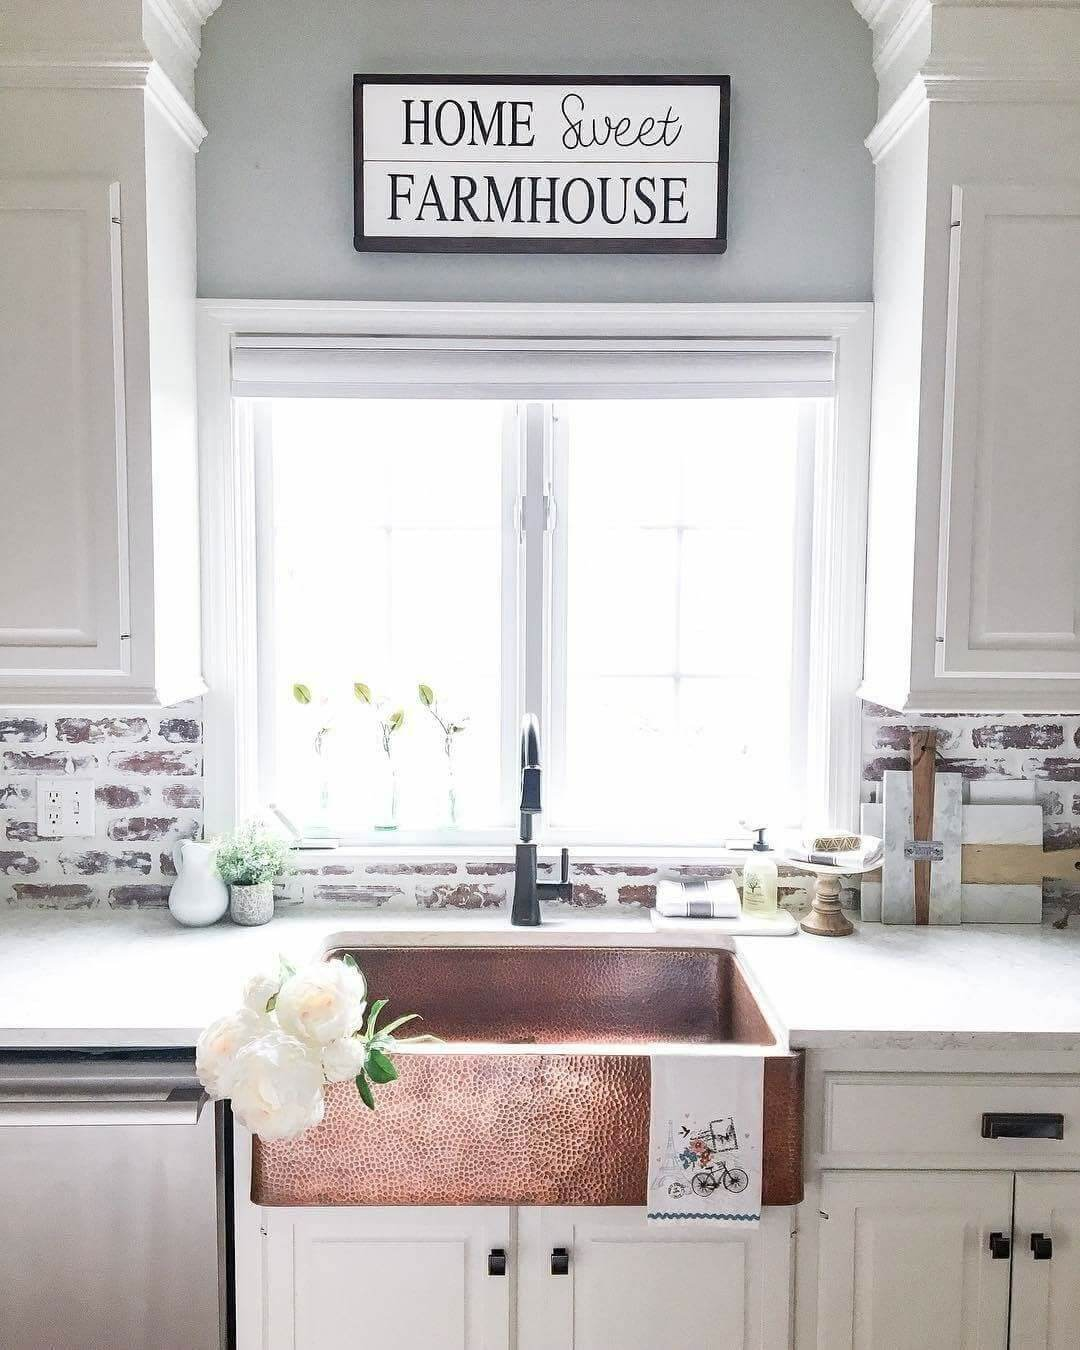 26 Farmhouse Kitchen Sink Ideas and Designs for 2020 on Kitchen Sink Ideas  id=33757